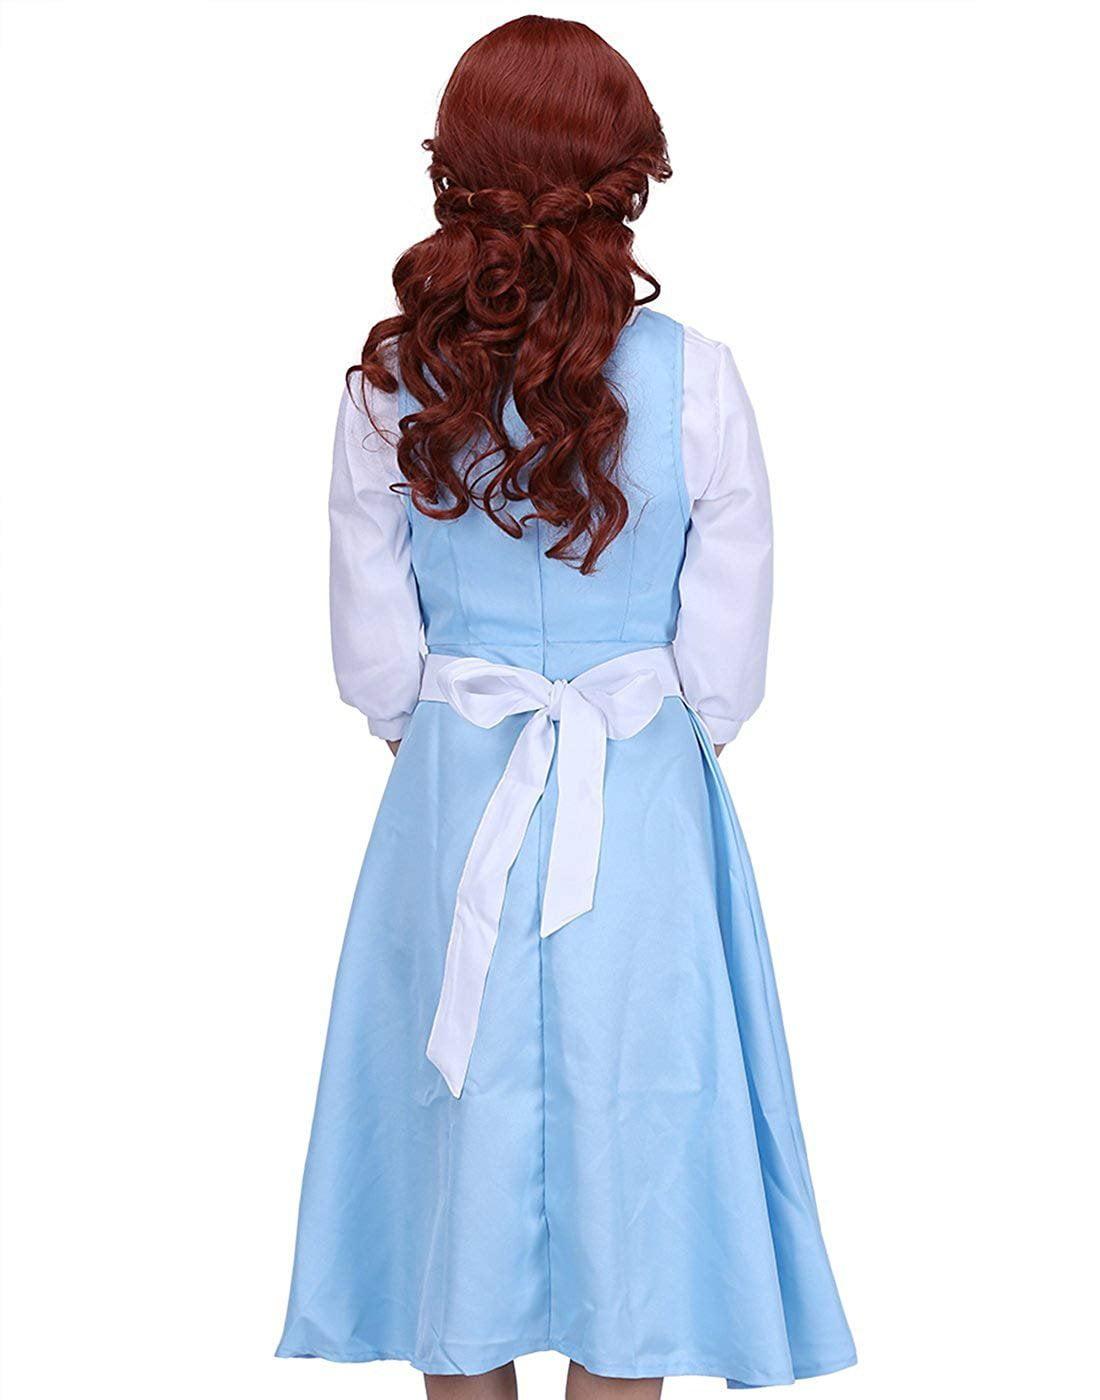 Adult Princess Belle Wig Pre-styled Curled Hair Women/'s Auburn Wig  w// Wig Cap